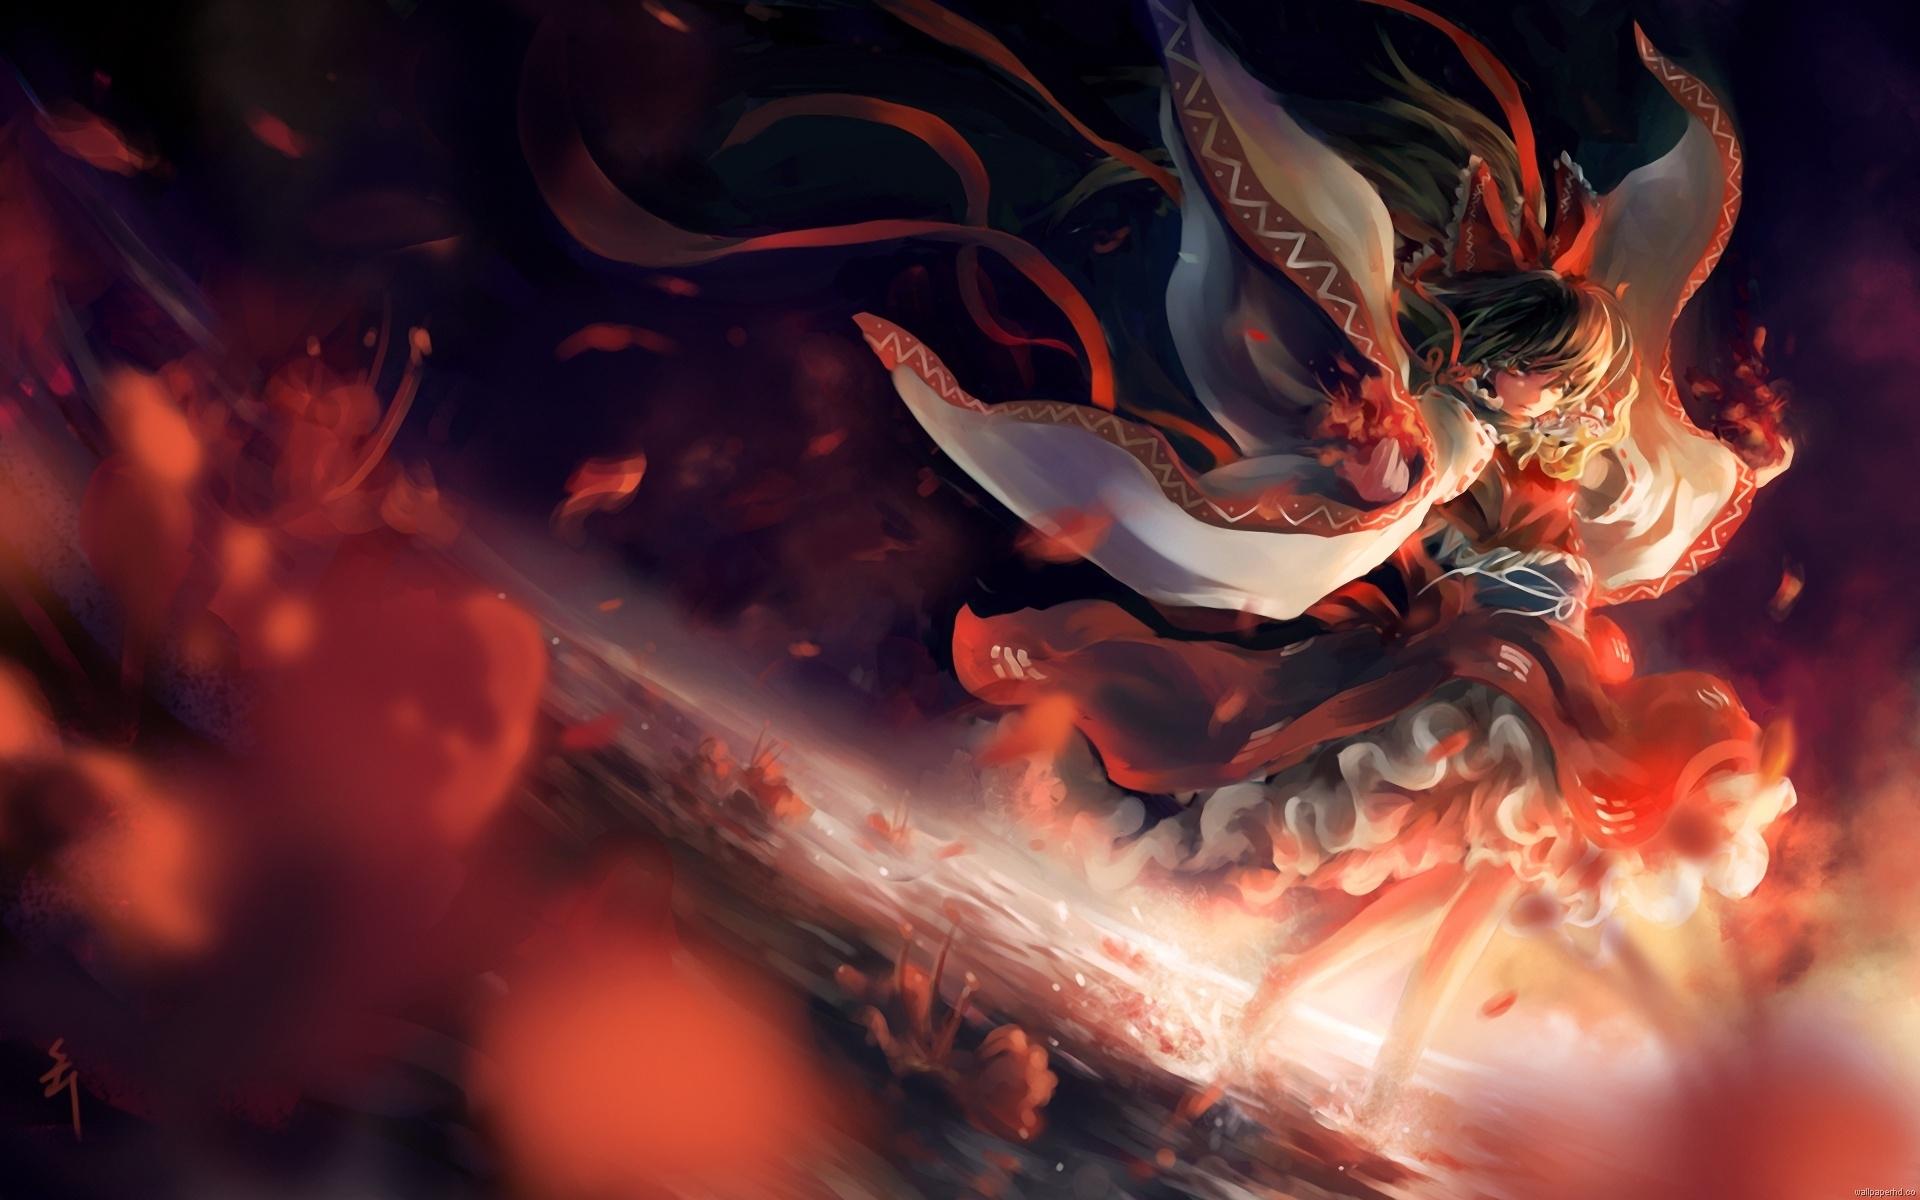 Anime HD Wallpaper Widecreen Desktop Anime Anime HD Wallpaper 32 1920x1200